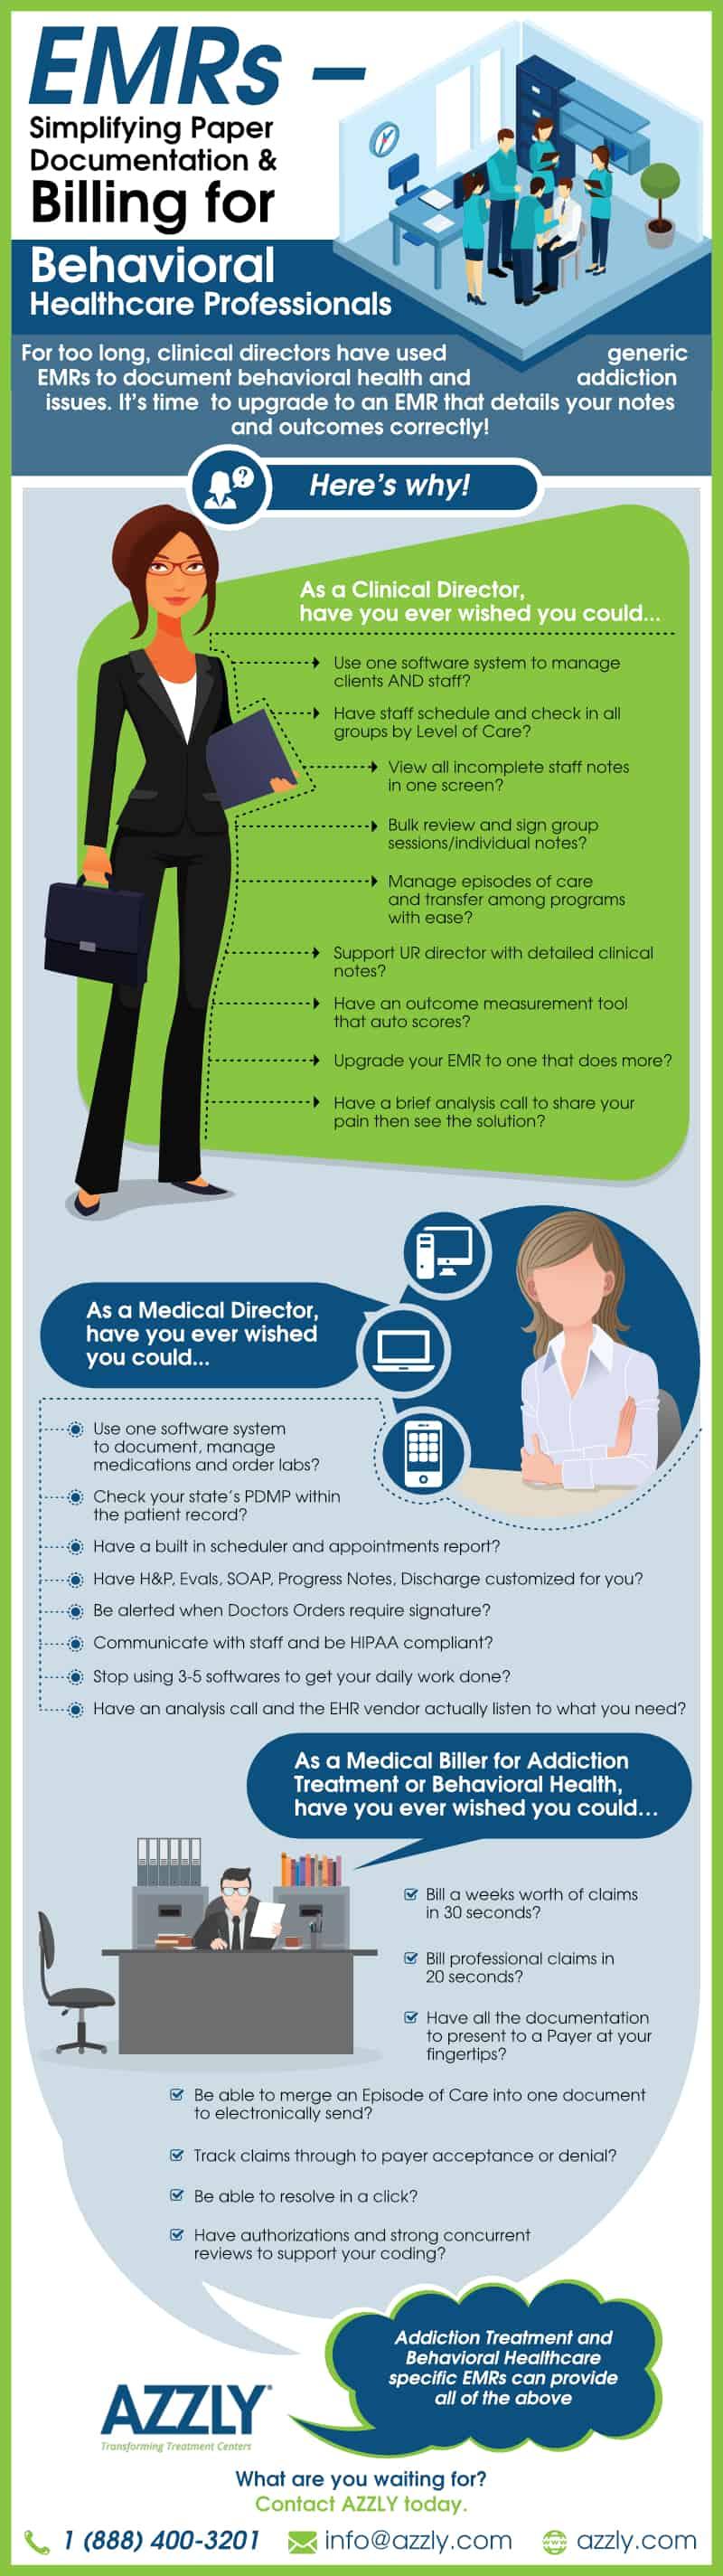 EMRs Simplifying Paper Documentation & Billing for Healthcare Professionals